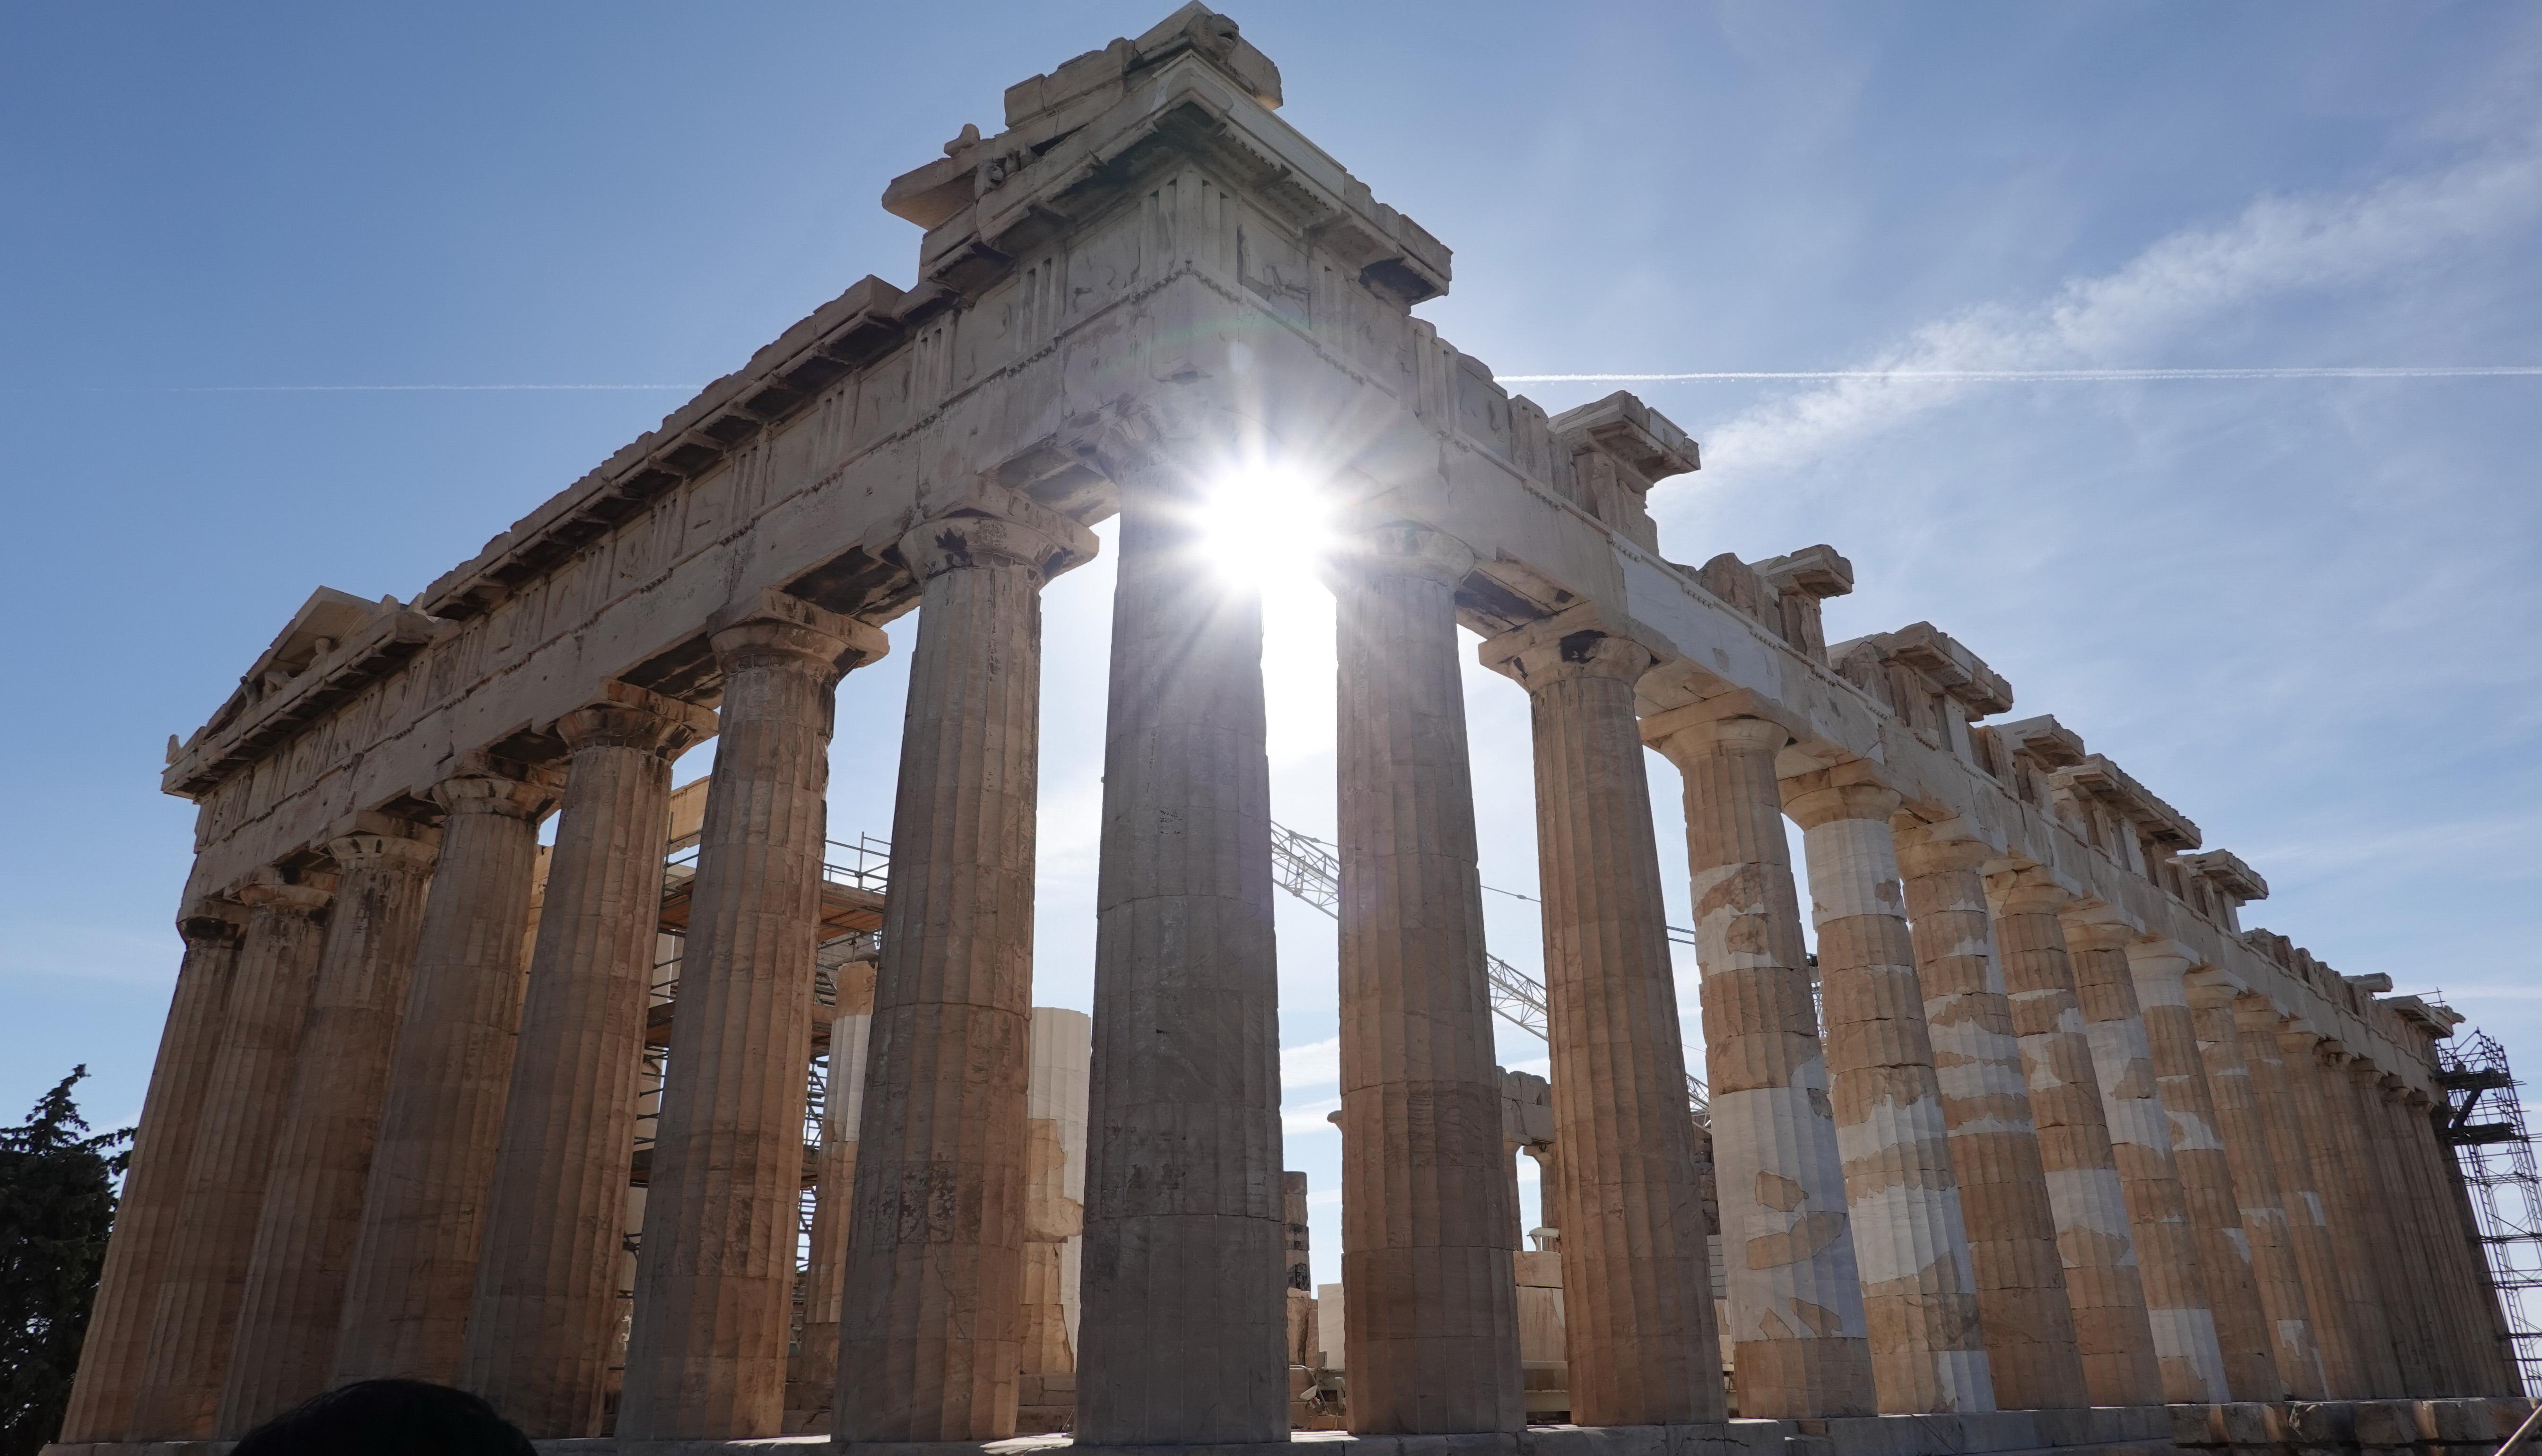 Xi's Trip to Greece, Brazil to Strengthen Ties, BRICS Cooperation